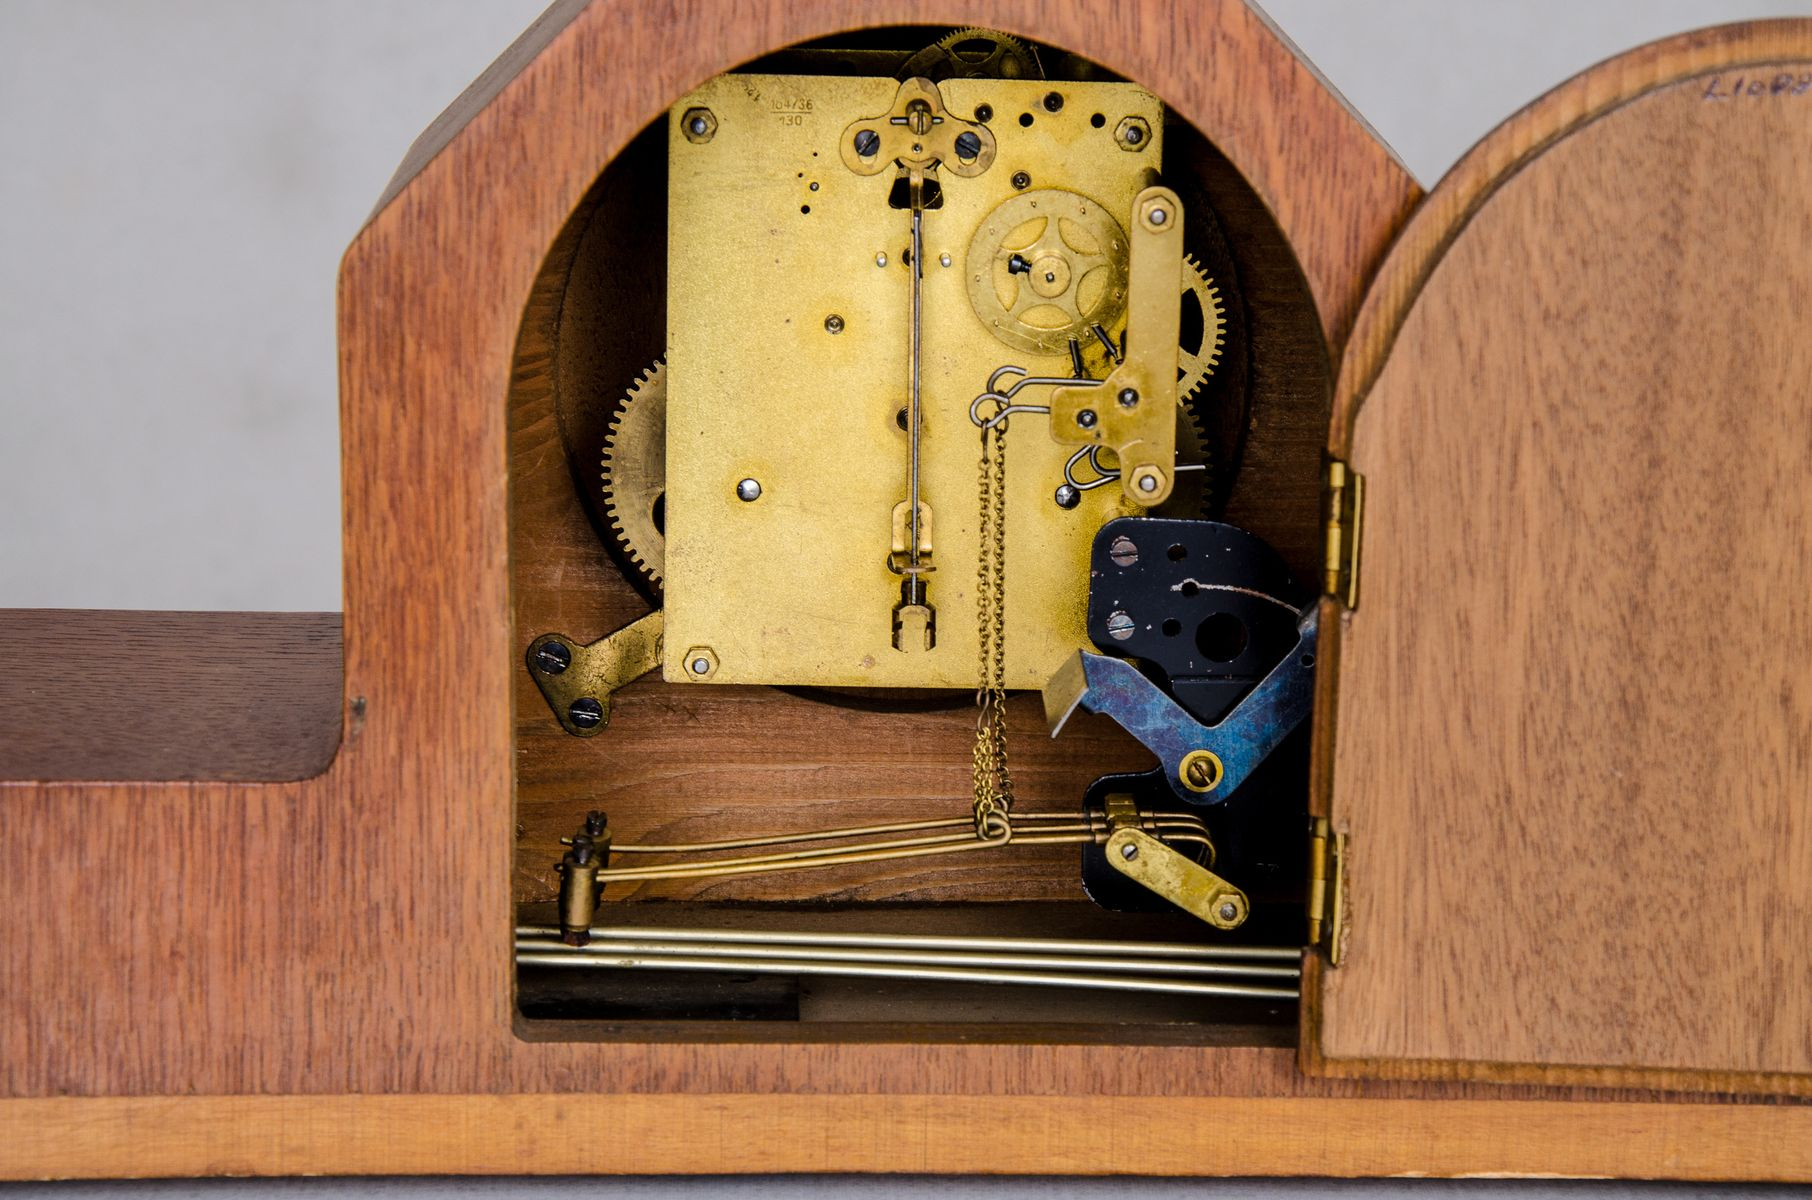 Dutch Art Deco Mantel Clock, 1930s for sale at Pamono